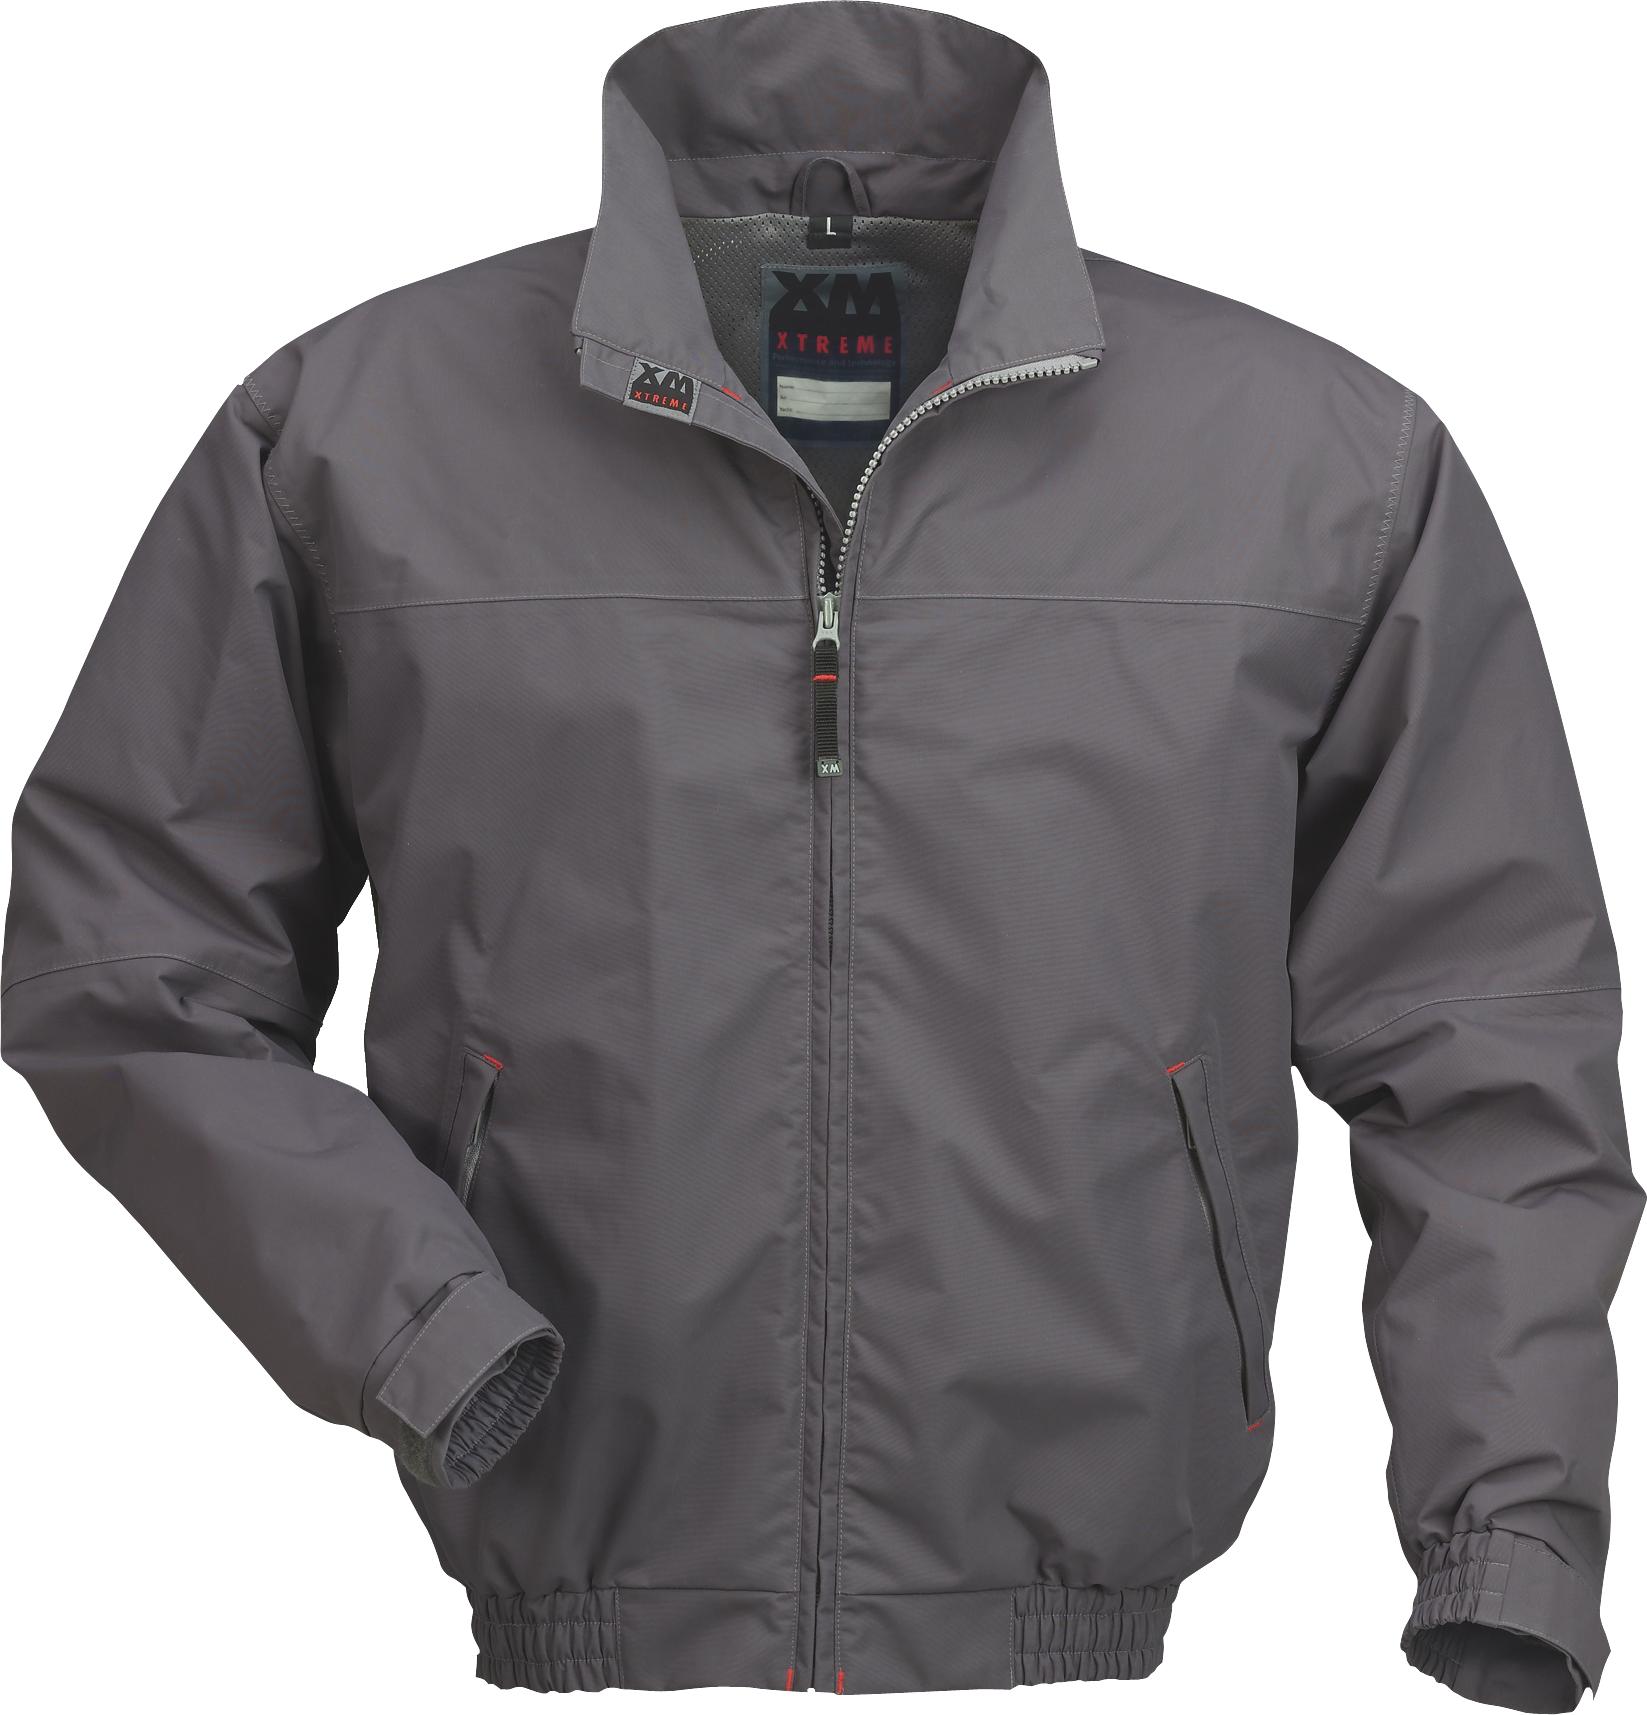 Xtreme png image purepng. Jacket clipart motorcycle jacket